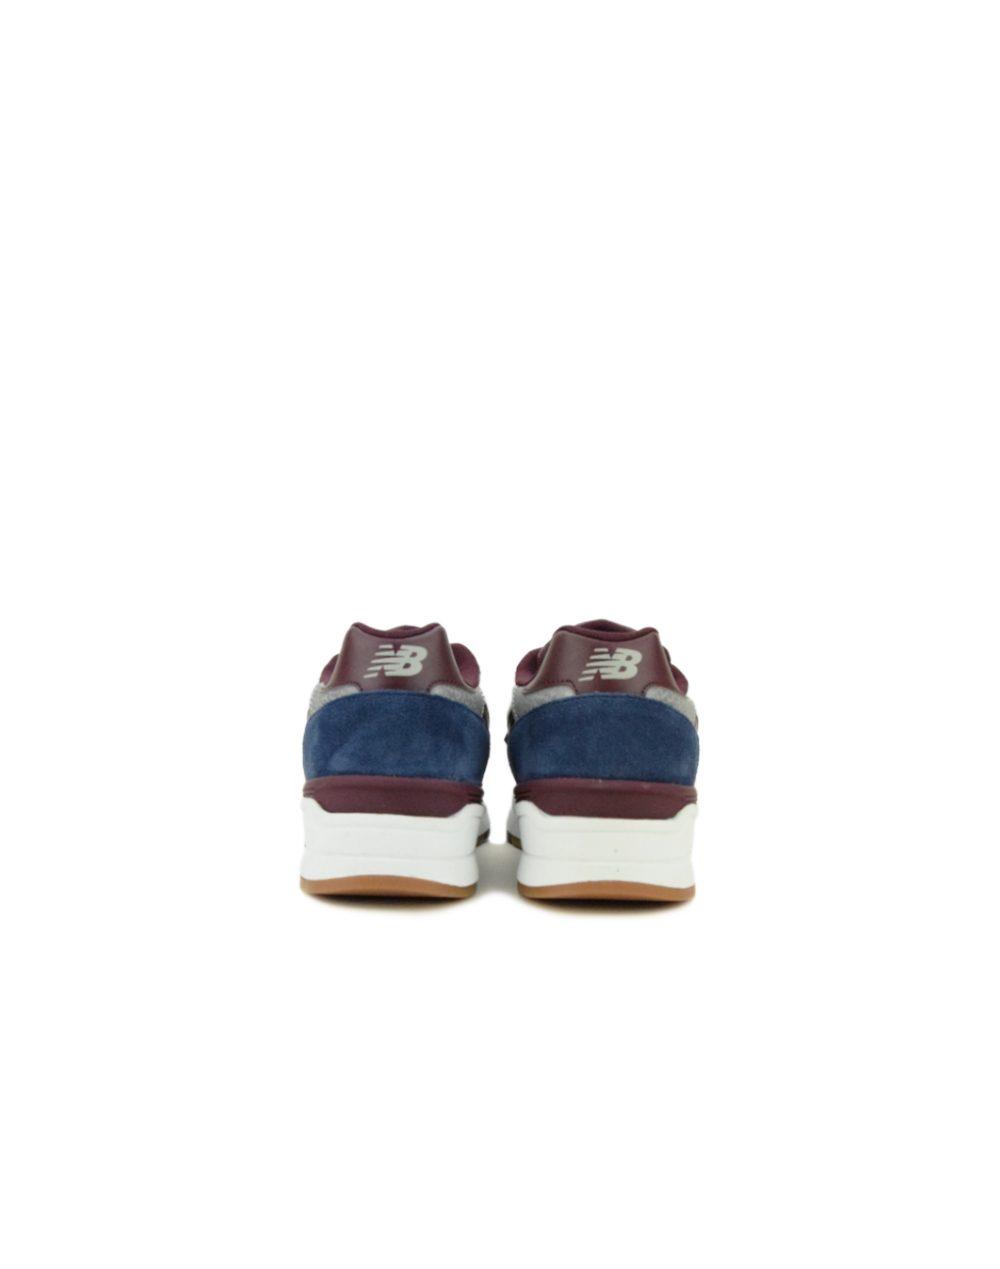 New Balance ML597GNB Blue/Grey